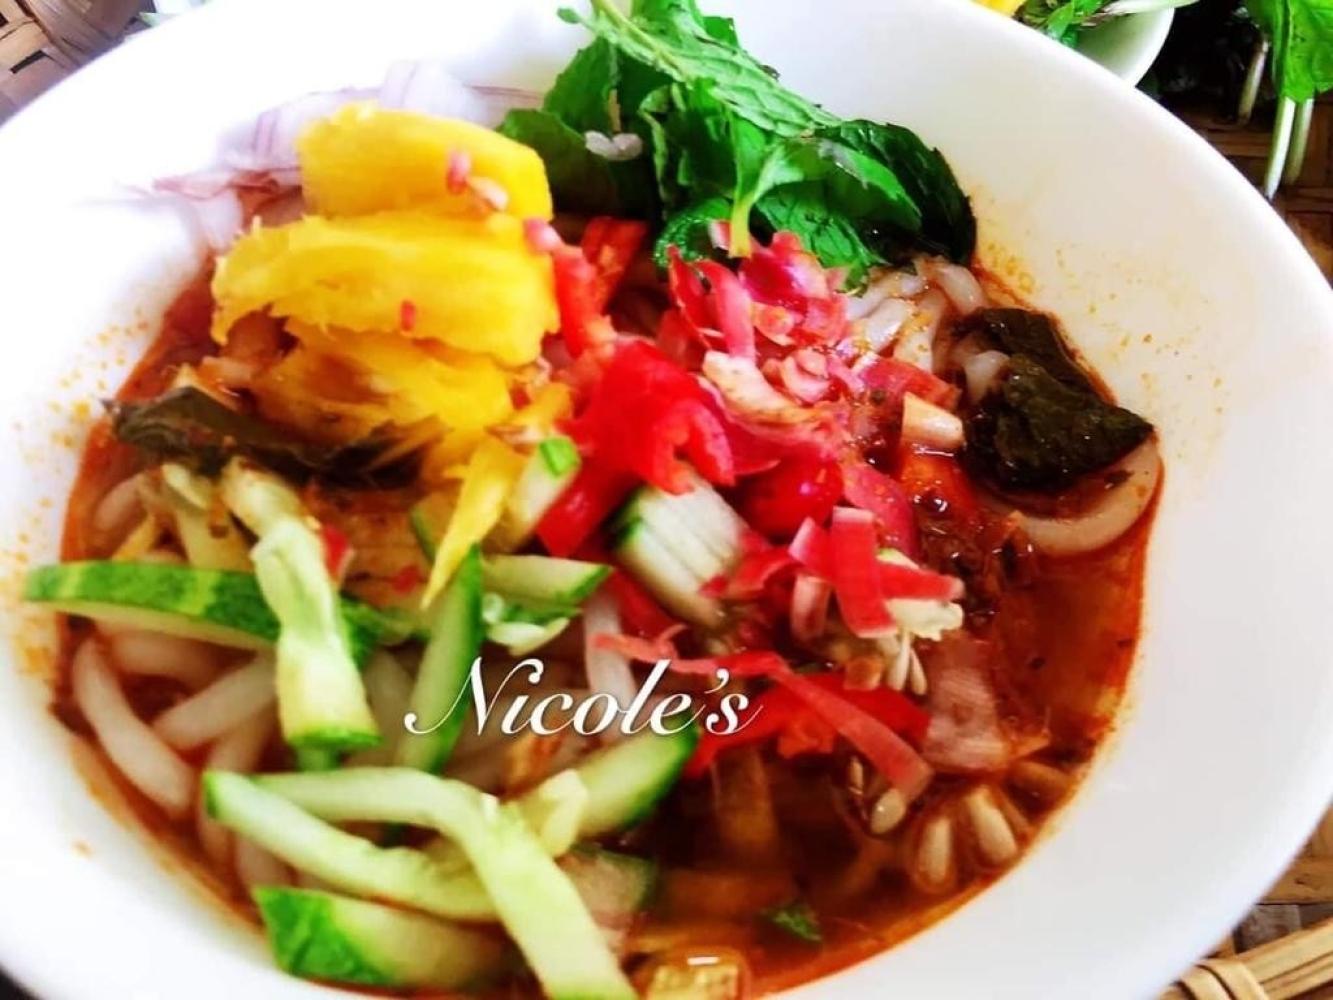 Penang Assam Laksa 槟城亚叁叻沙酱